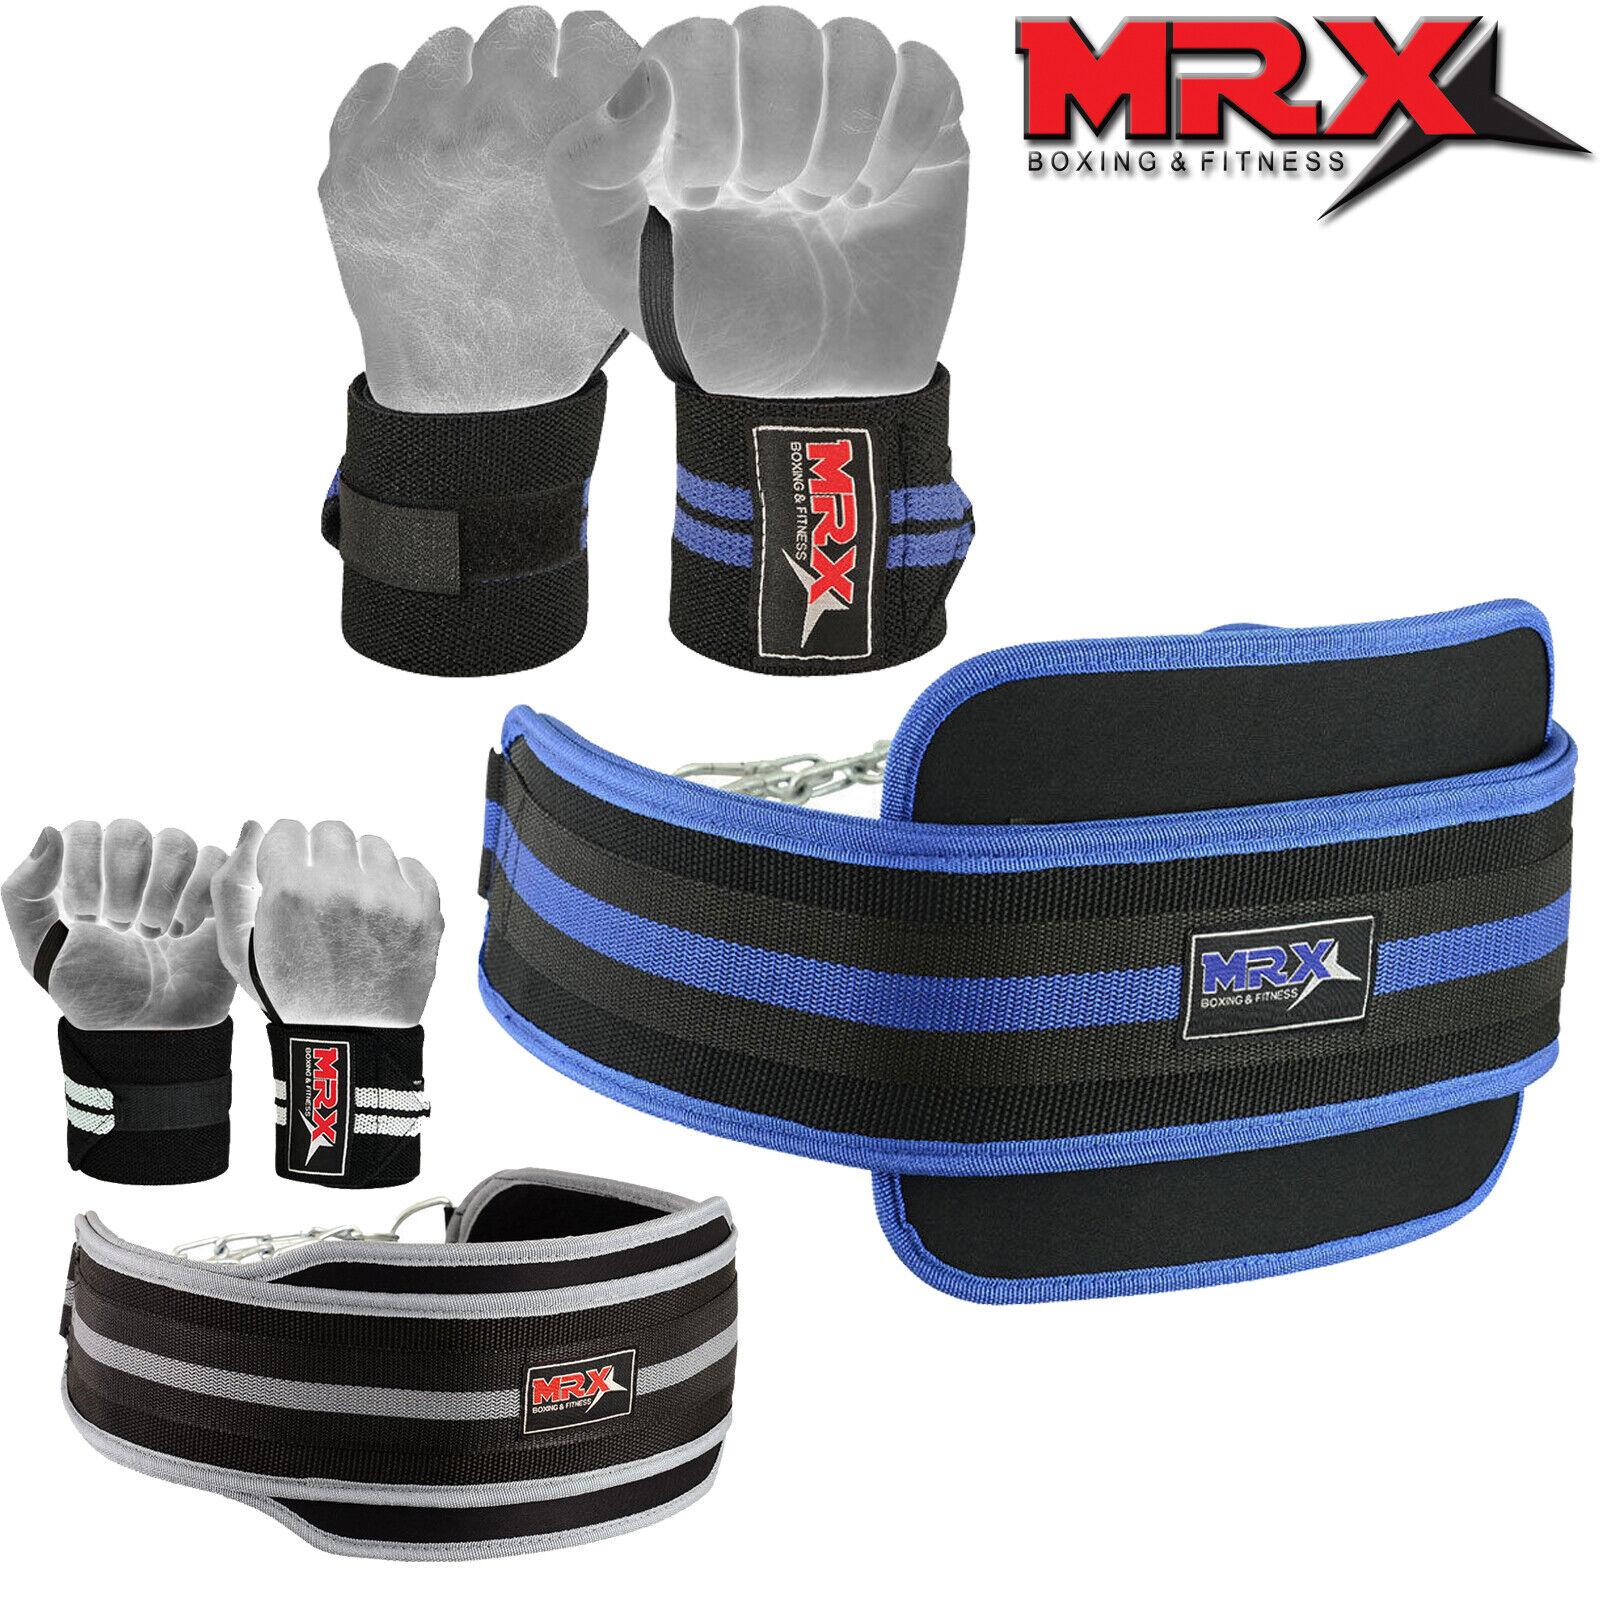 Weight Lifting Power Training Bodybuilding Dip Belt Wrist Support Gloves Fitness